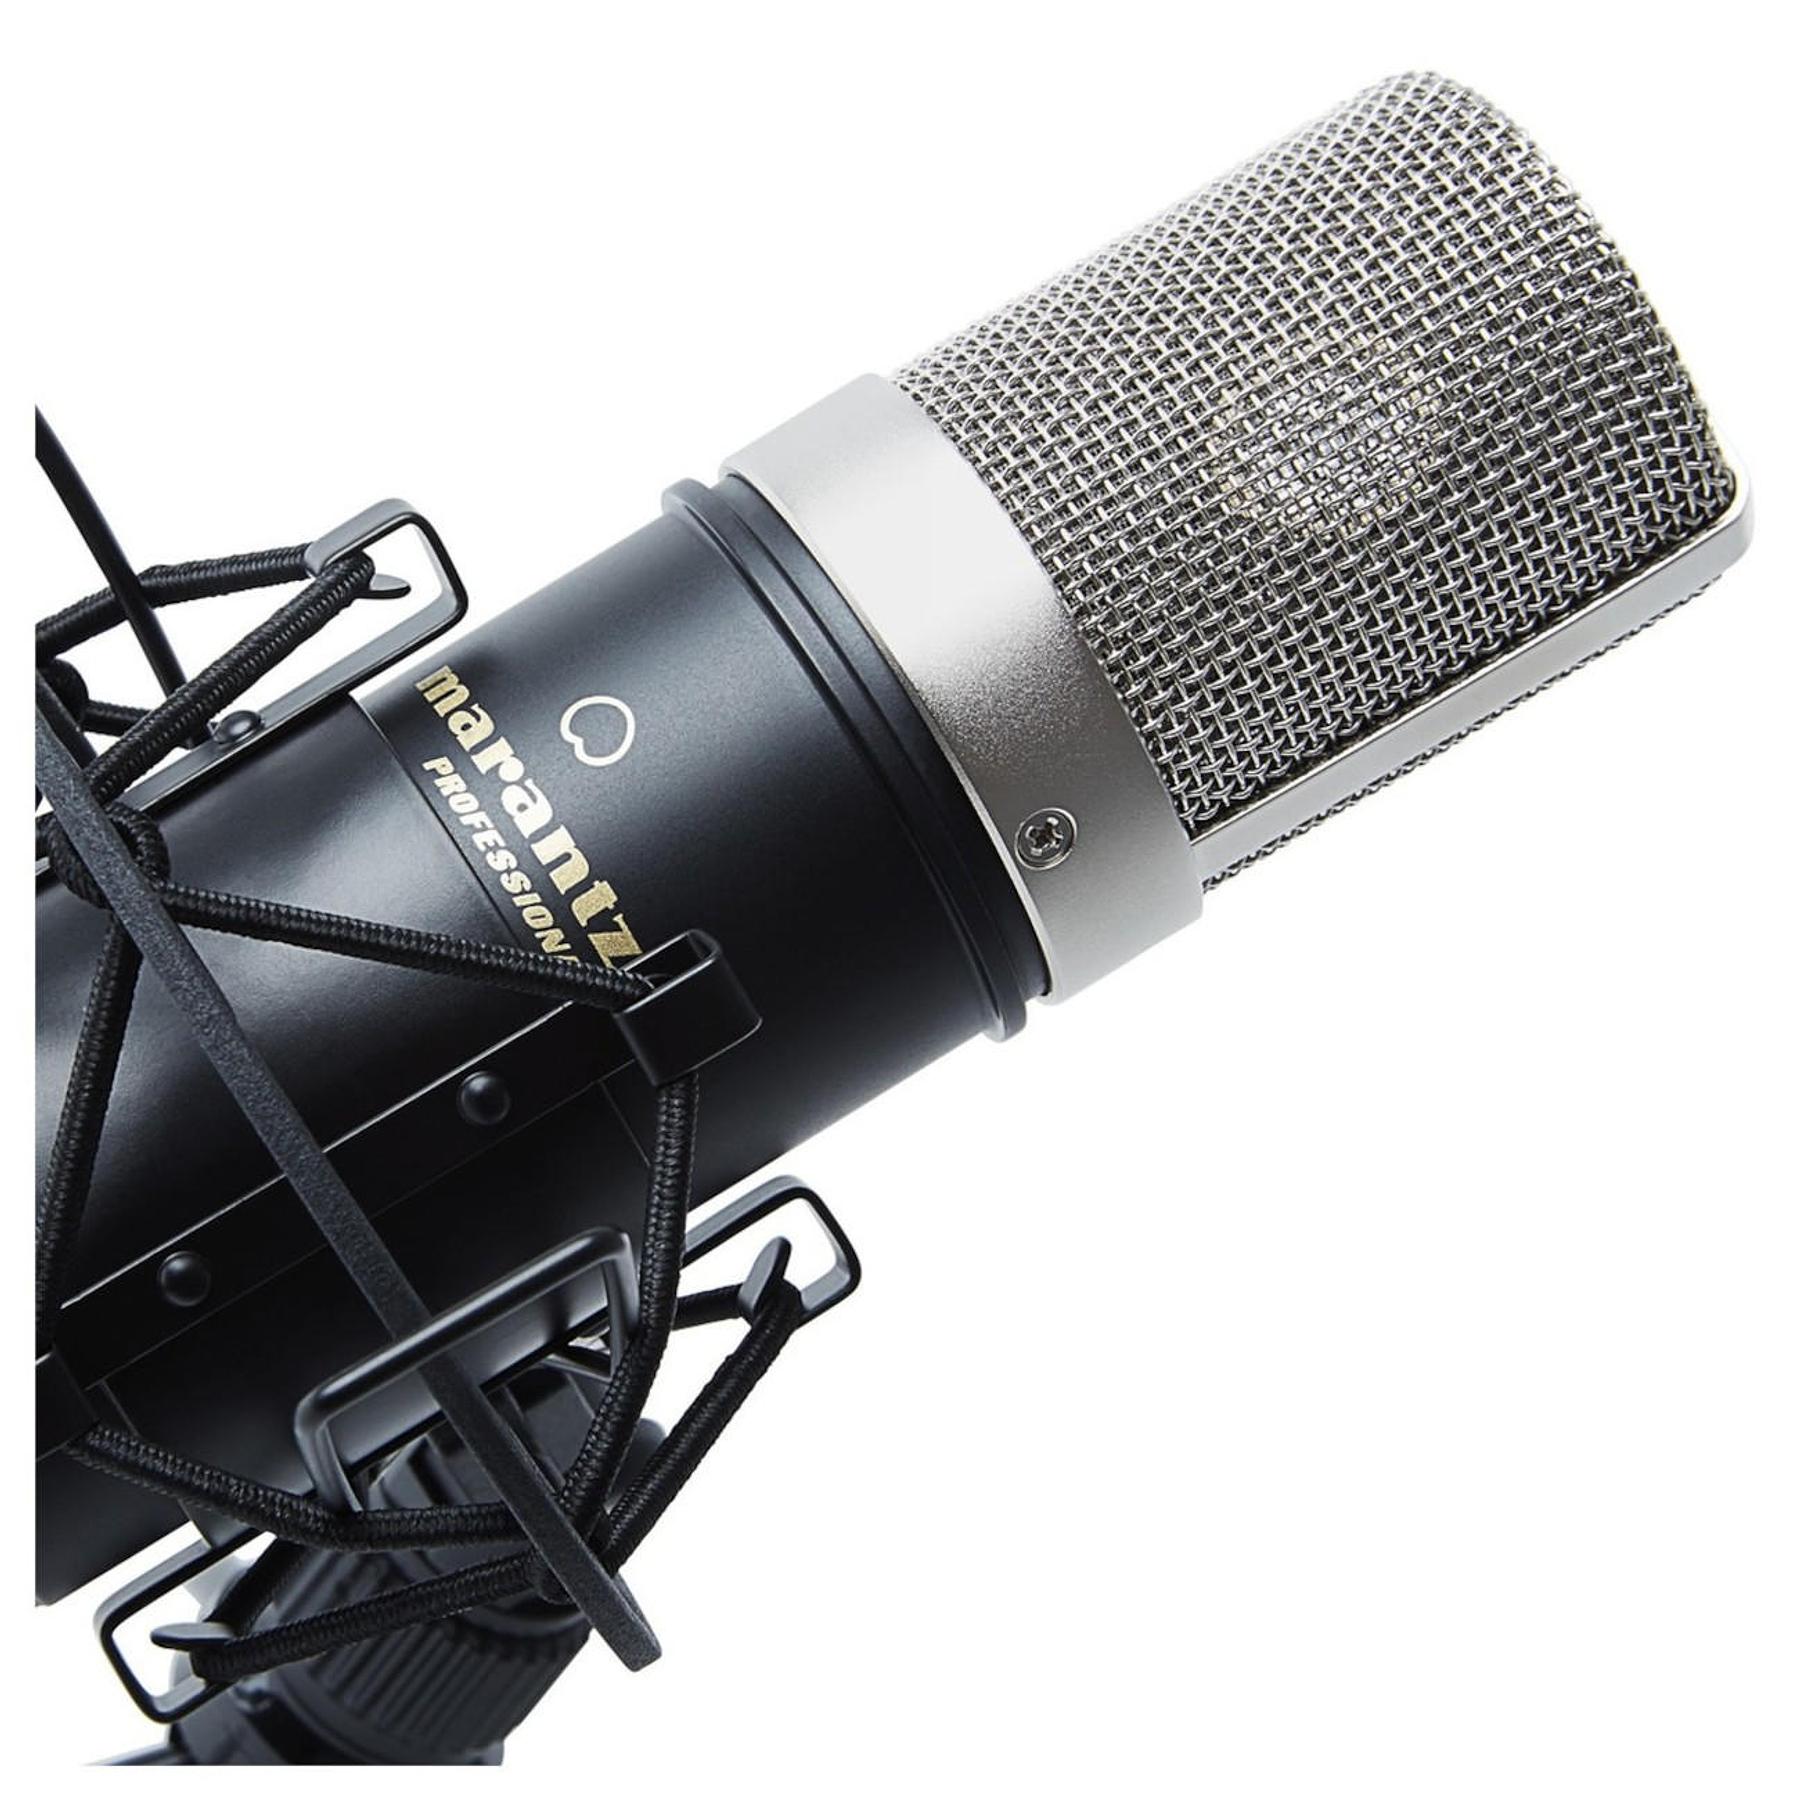 Microfono Condensador XLR Marantz MPM-1000